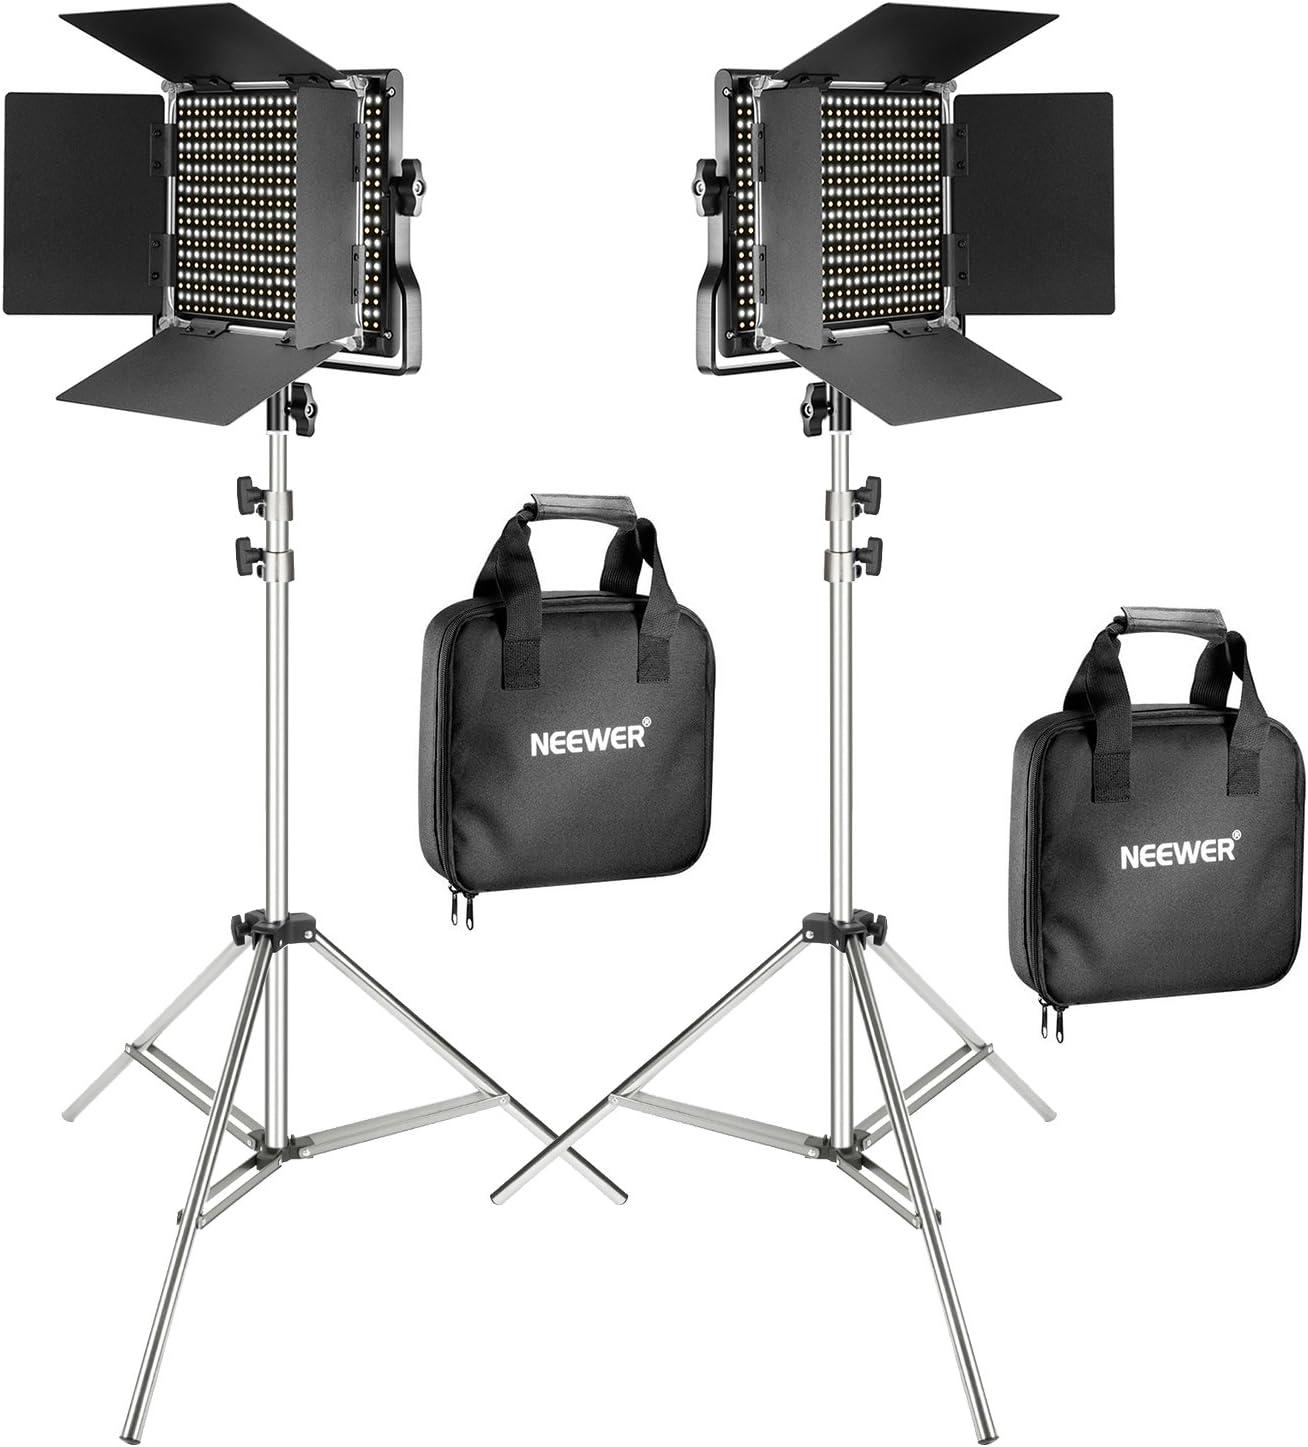 Neewer Kit de 2 Paneles LED Regulable Bicolor 660 Video Luz con Soporte de Luz 2m:Panel LED Regulable Bicolor con Soporte U,3200-5600K,CRI 96+ para Estudio Retrato,YouTube Video Fotografía